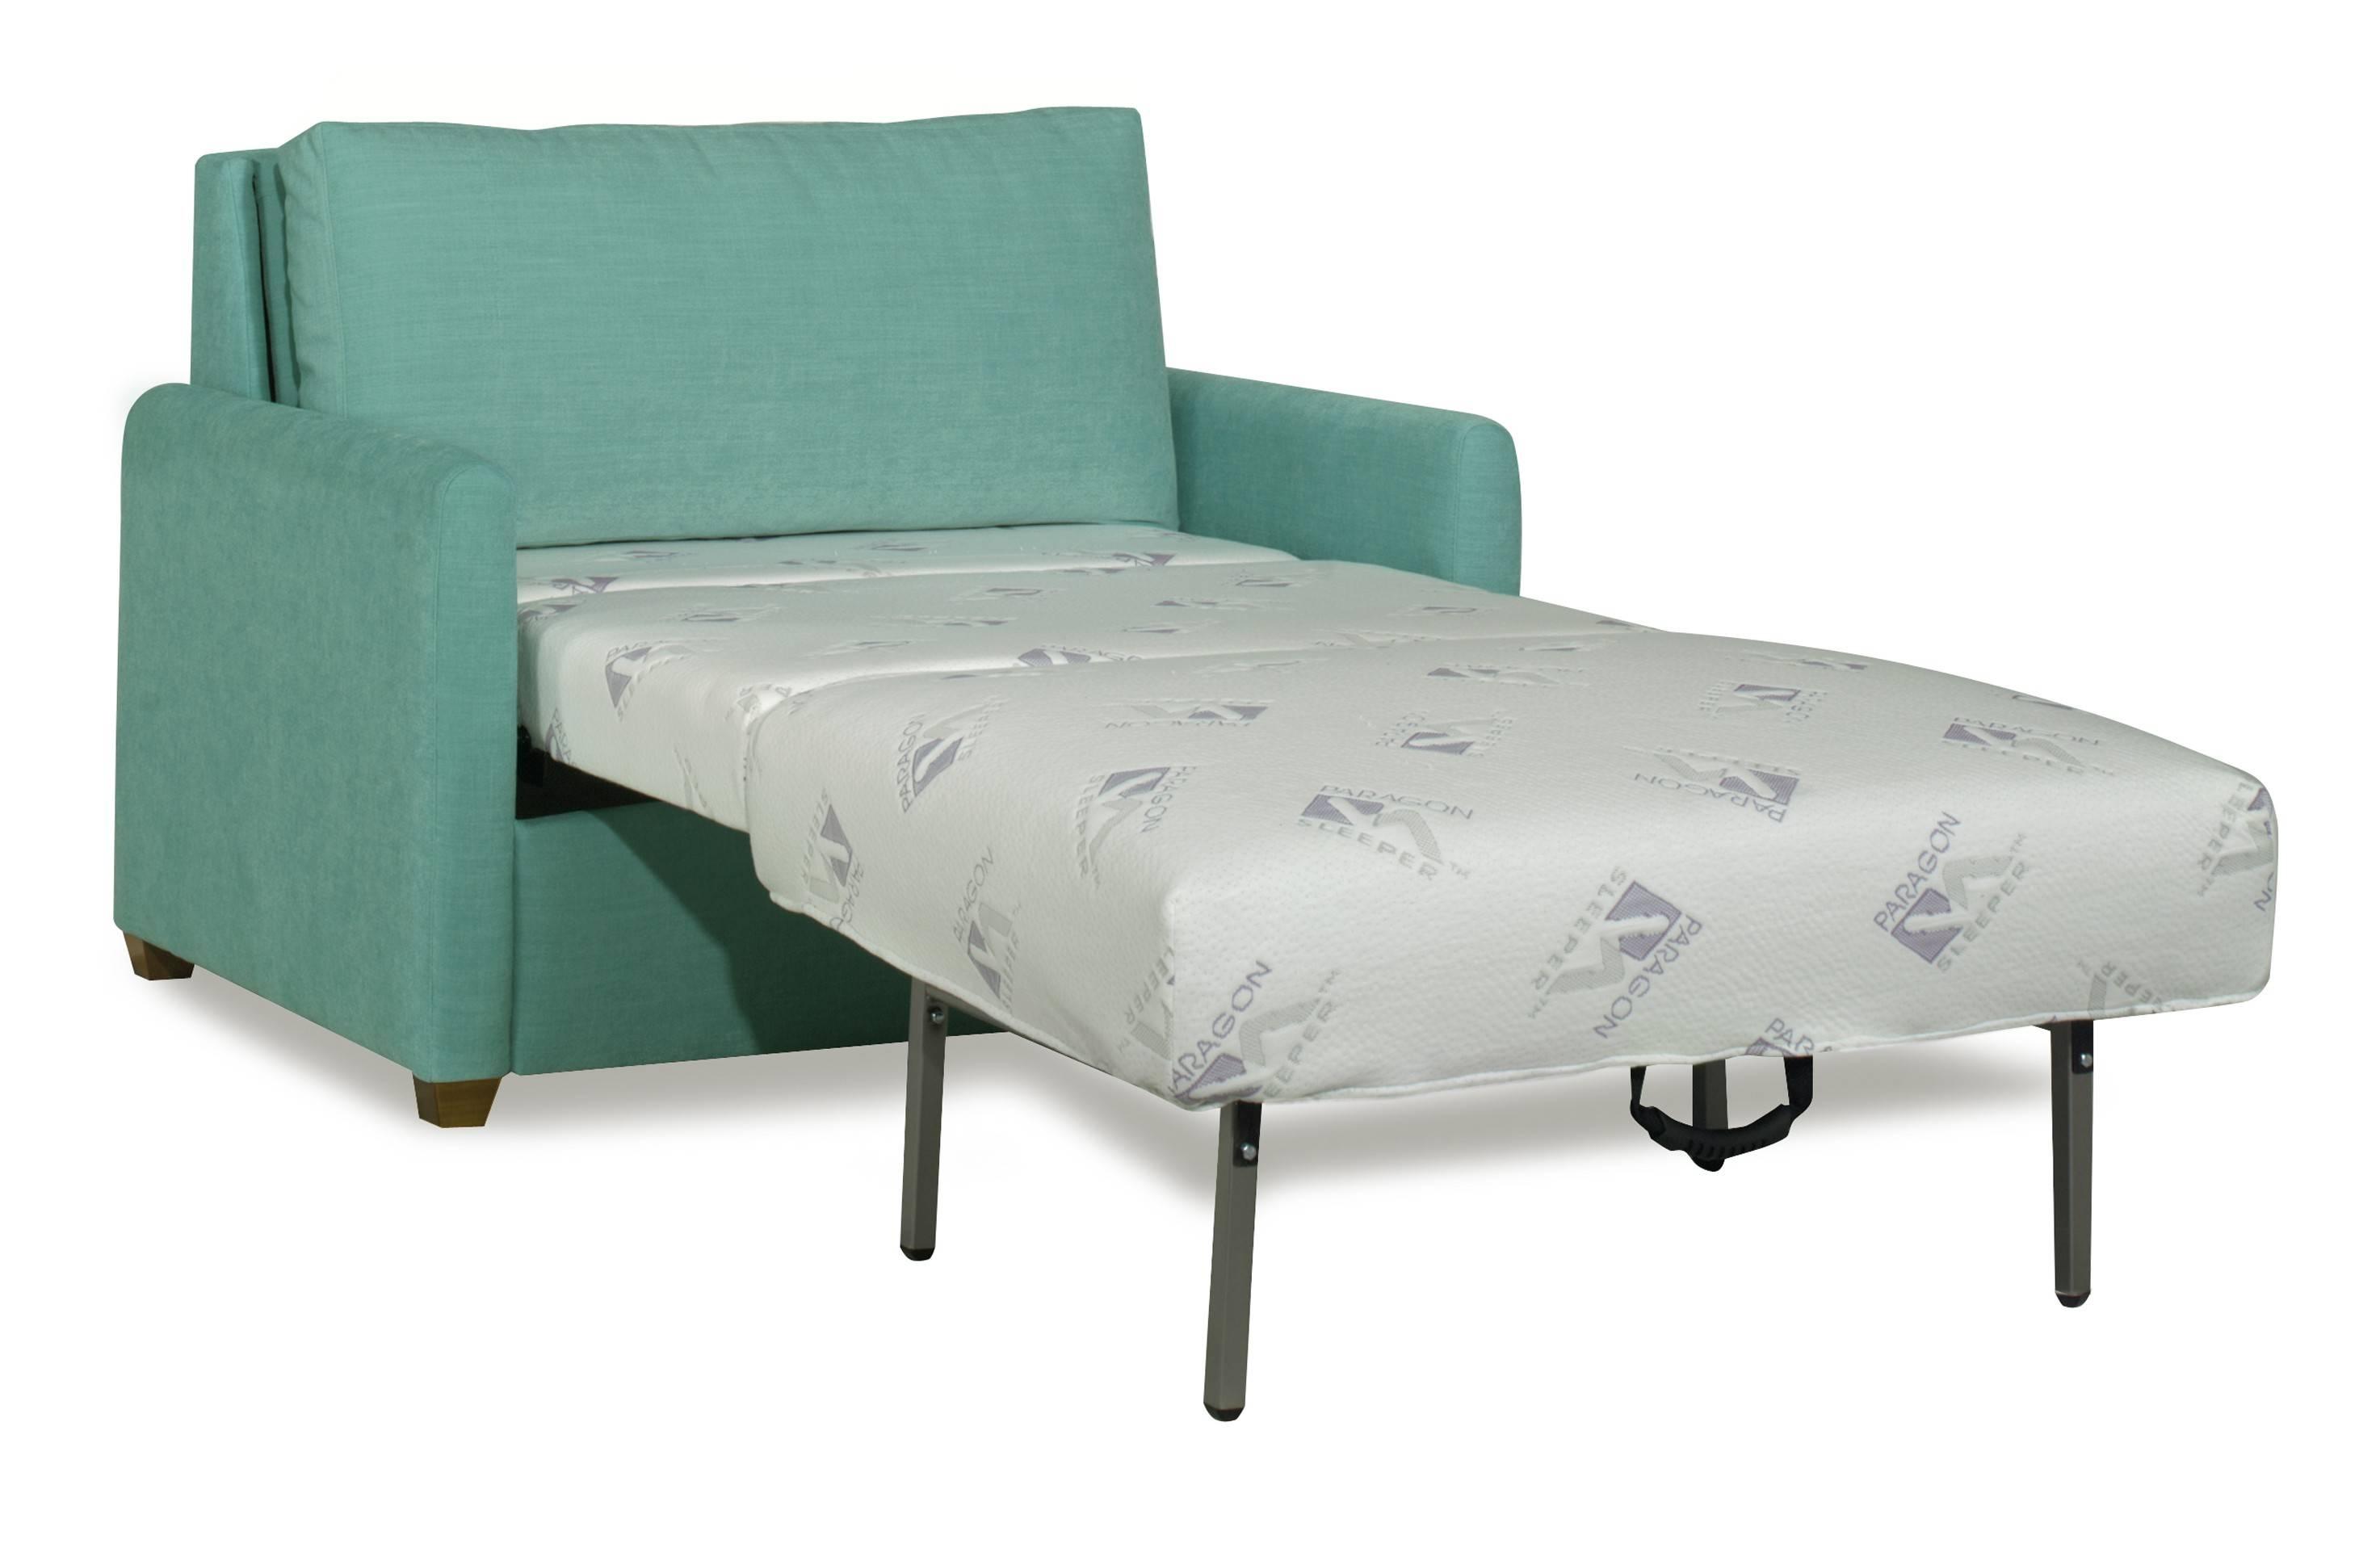 Loveseat Pull Out Bed Loveseat Pull Out Bed Amazing Home Ideas